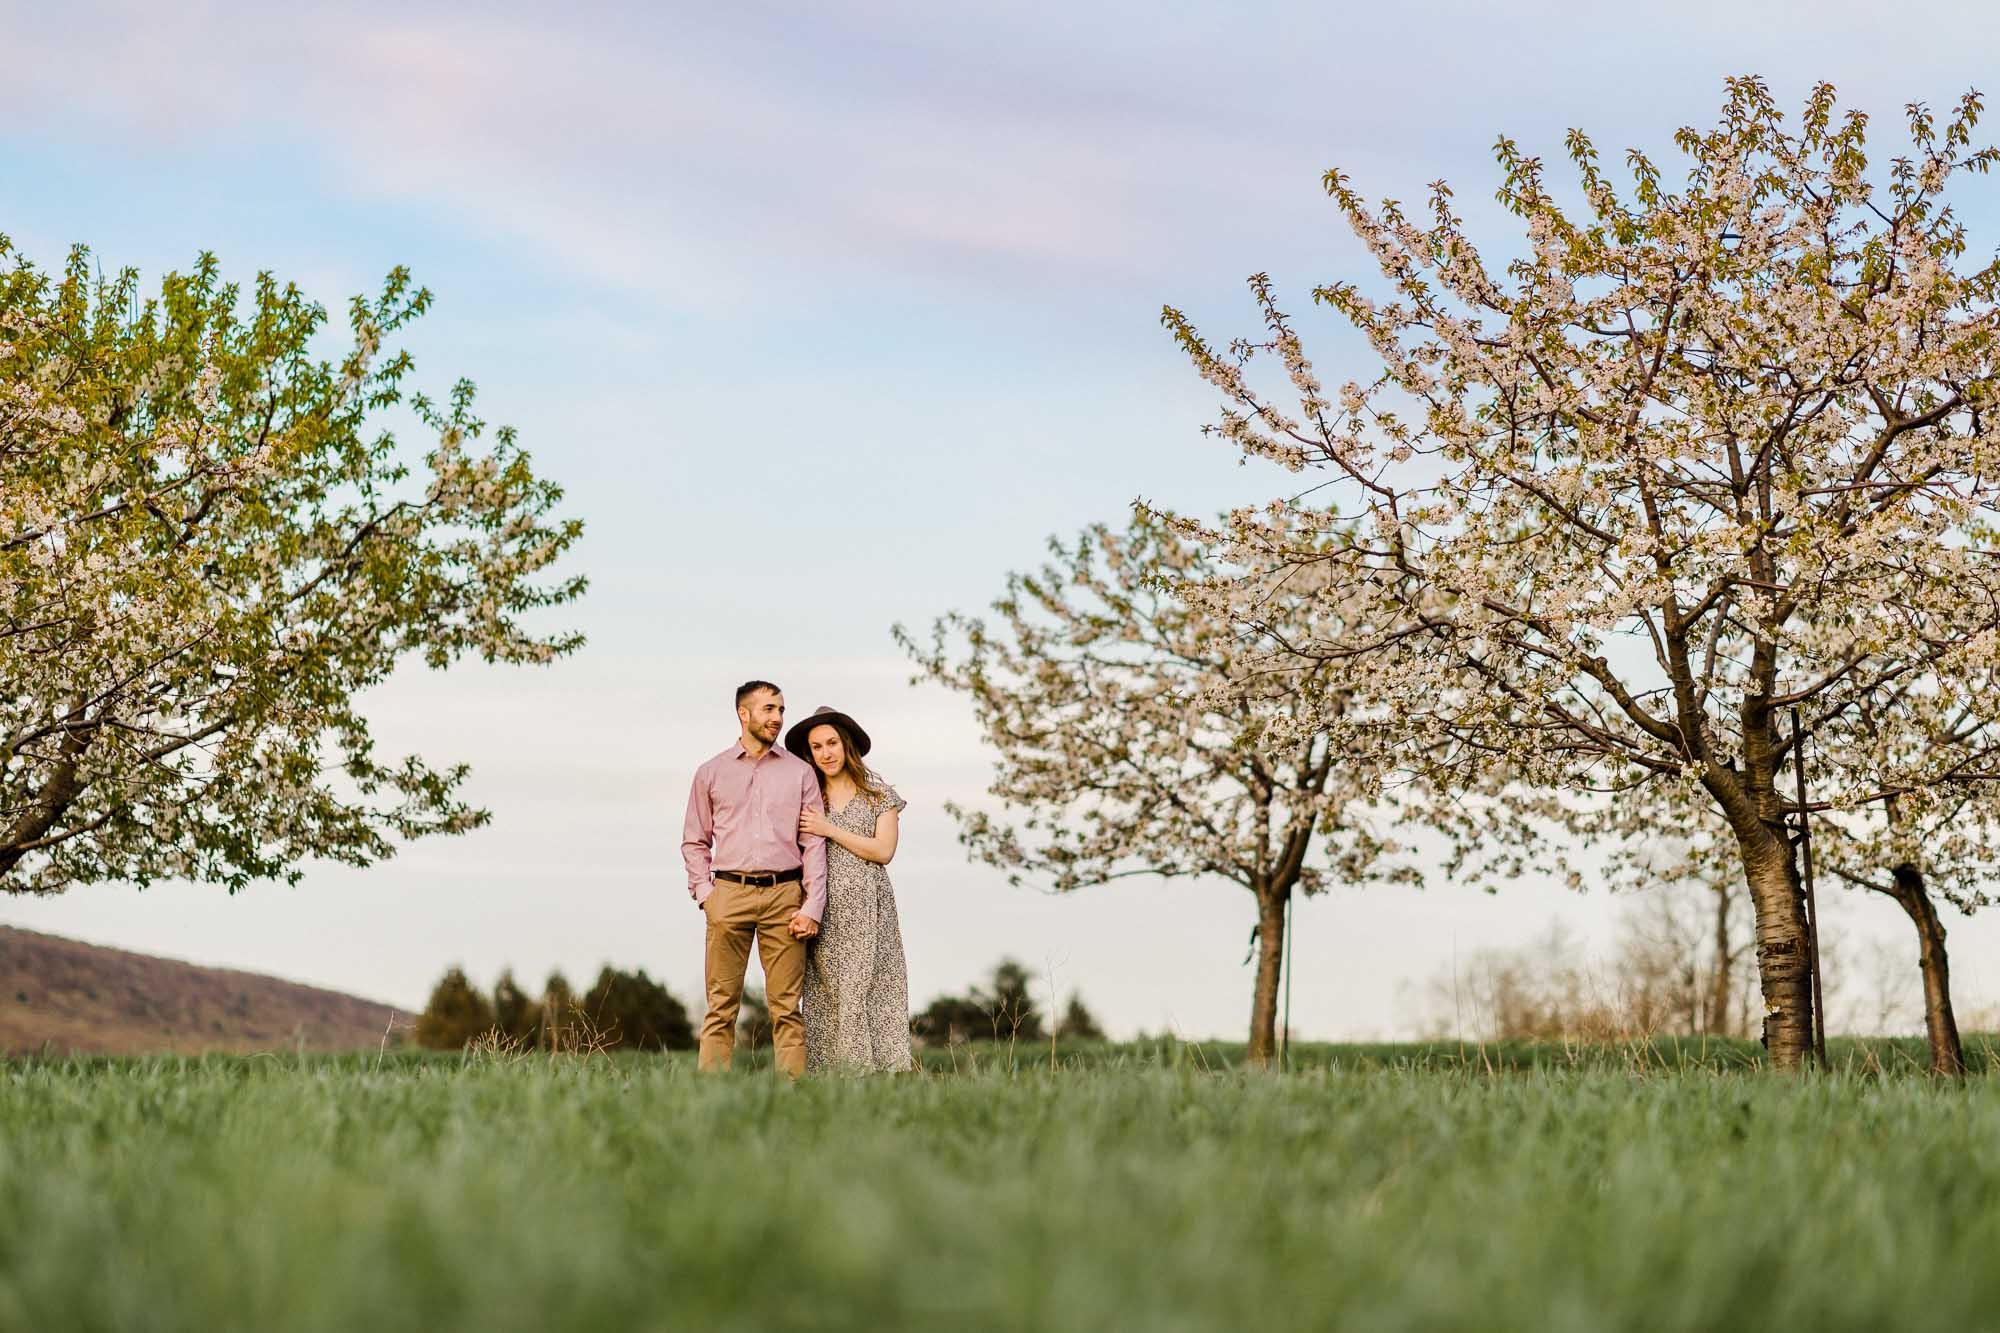 Rohrbachs-Spring-cherry-blossom-engagement-7790.jpg